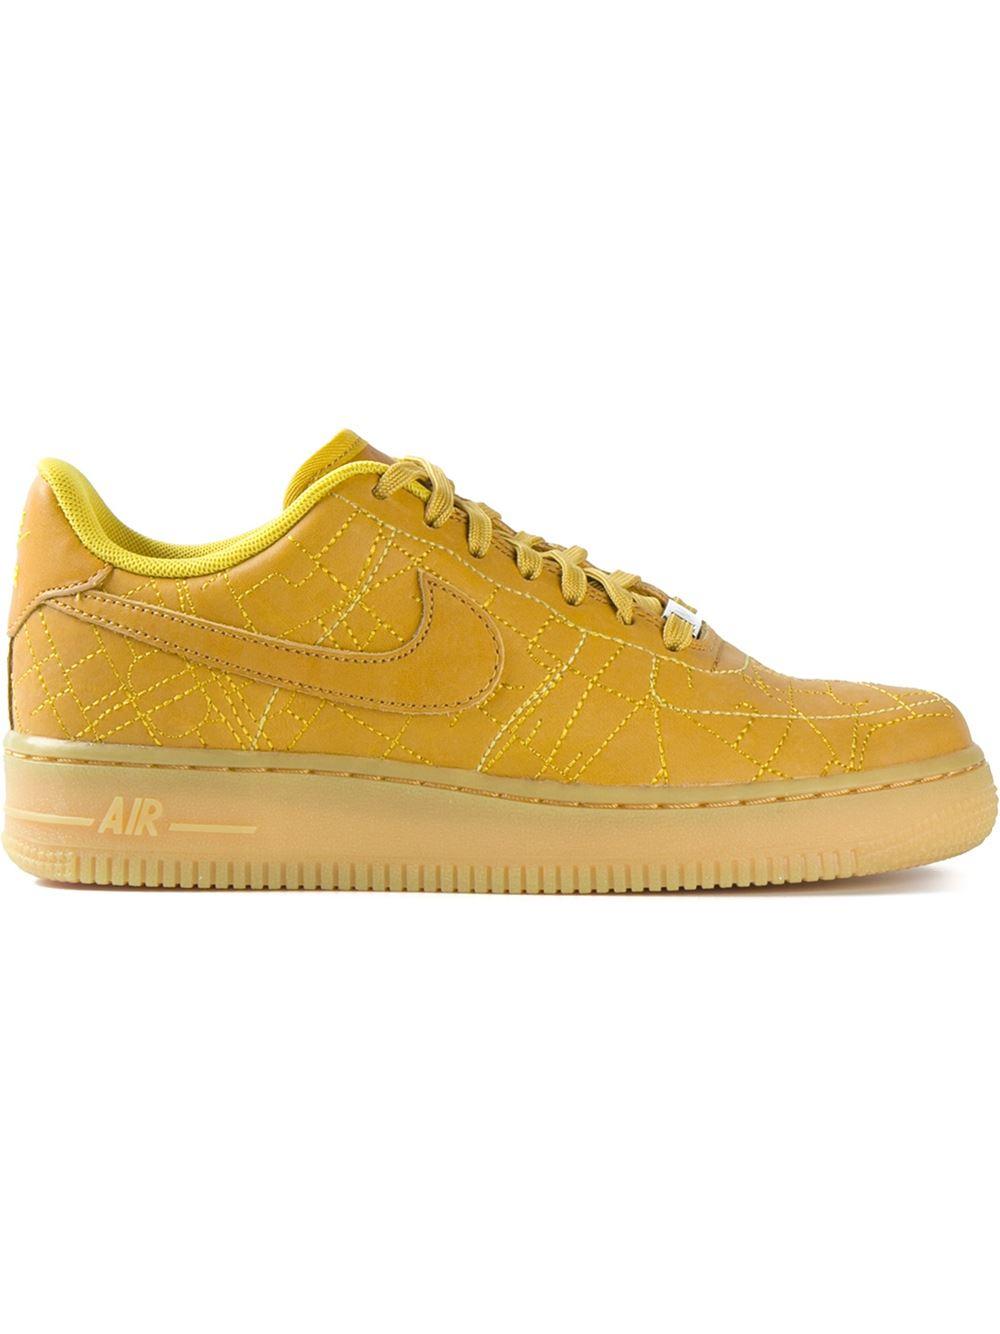 Nike Air Force 1 High Gold